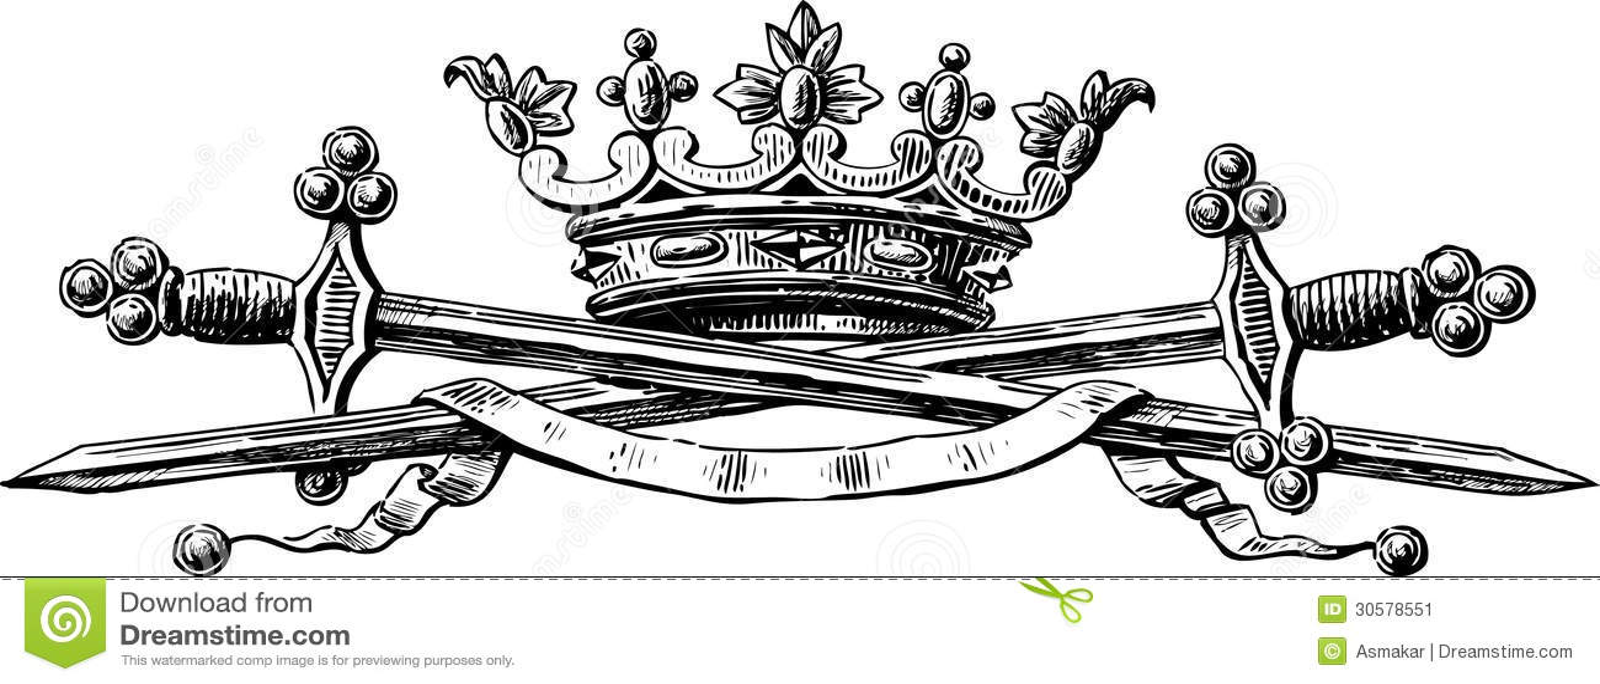 symbols of power stock image image of heraldry regal